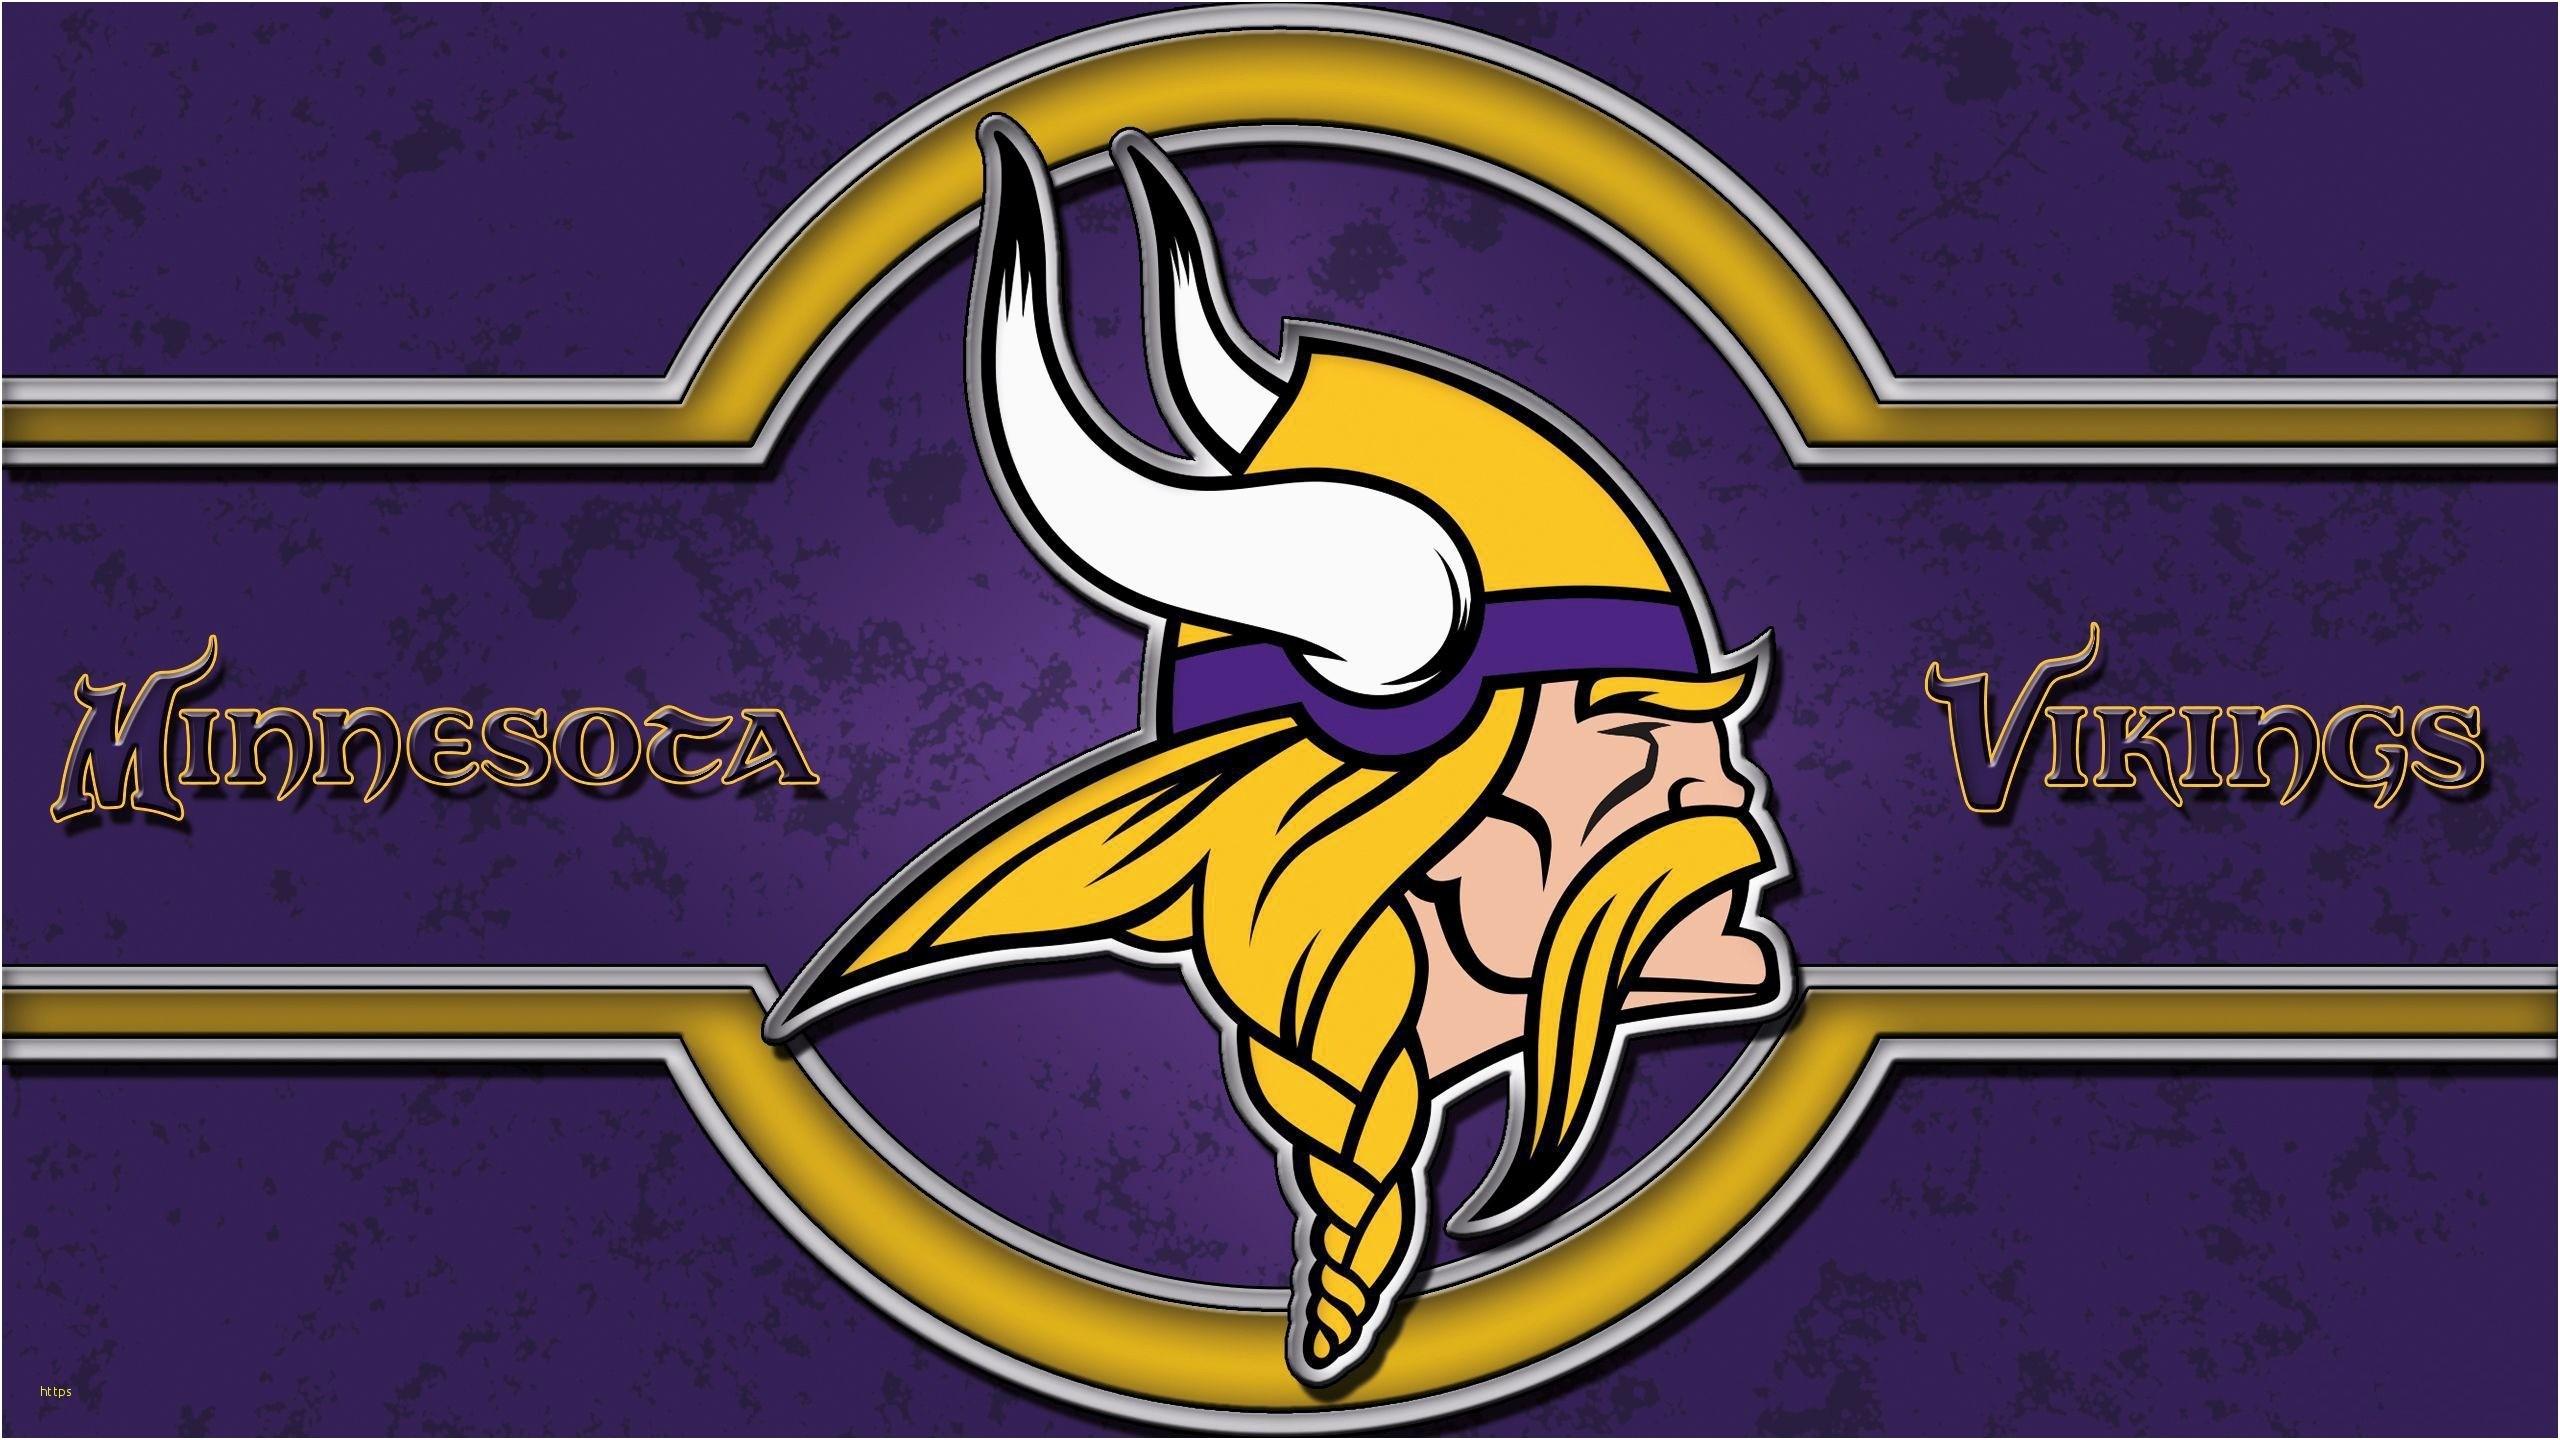 Res: 2560x1440, Minnesota Vikings Wallpaper Elegant Minnesota Vikings Free Hd Wallpapers  Backgrounds